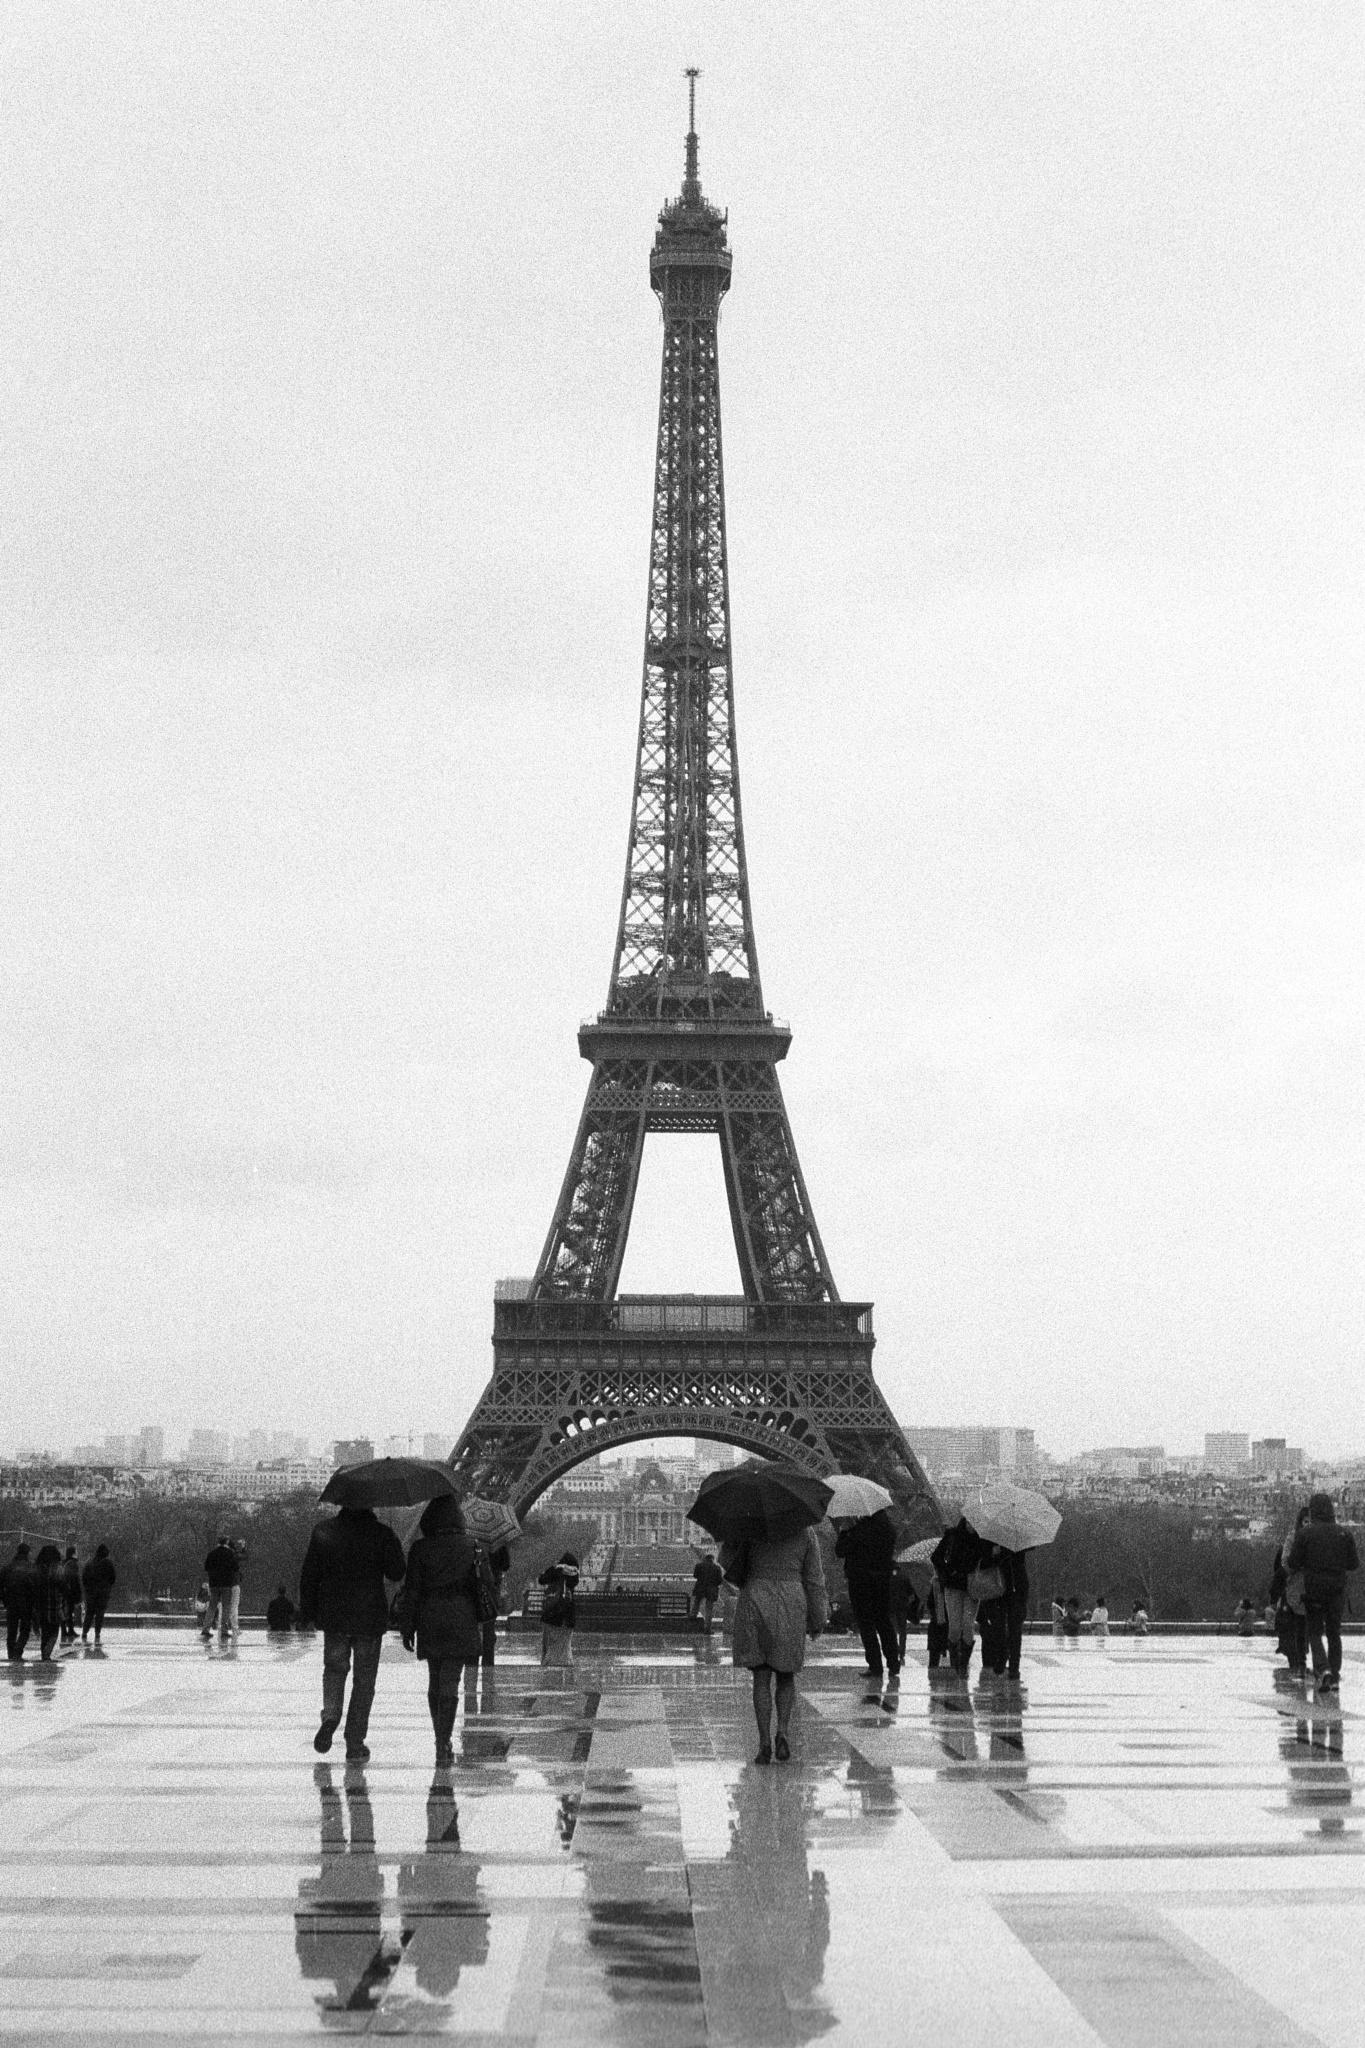 Tour De Eiffel by Jimmy Cheng